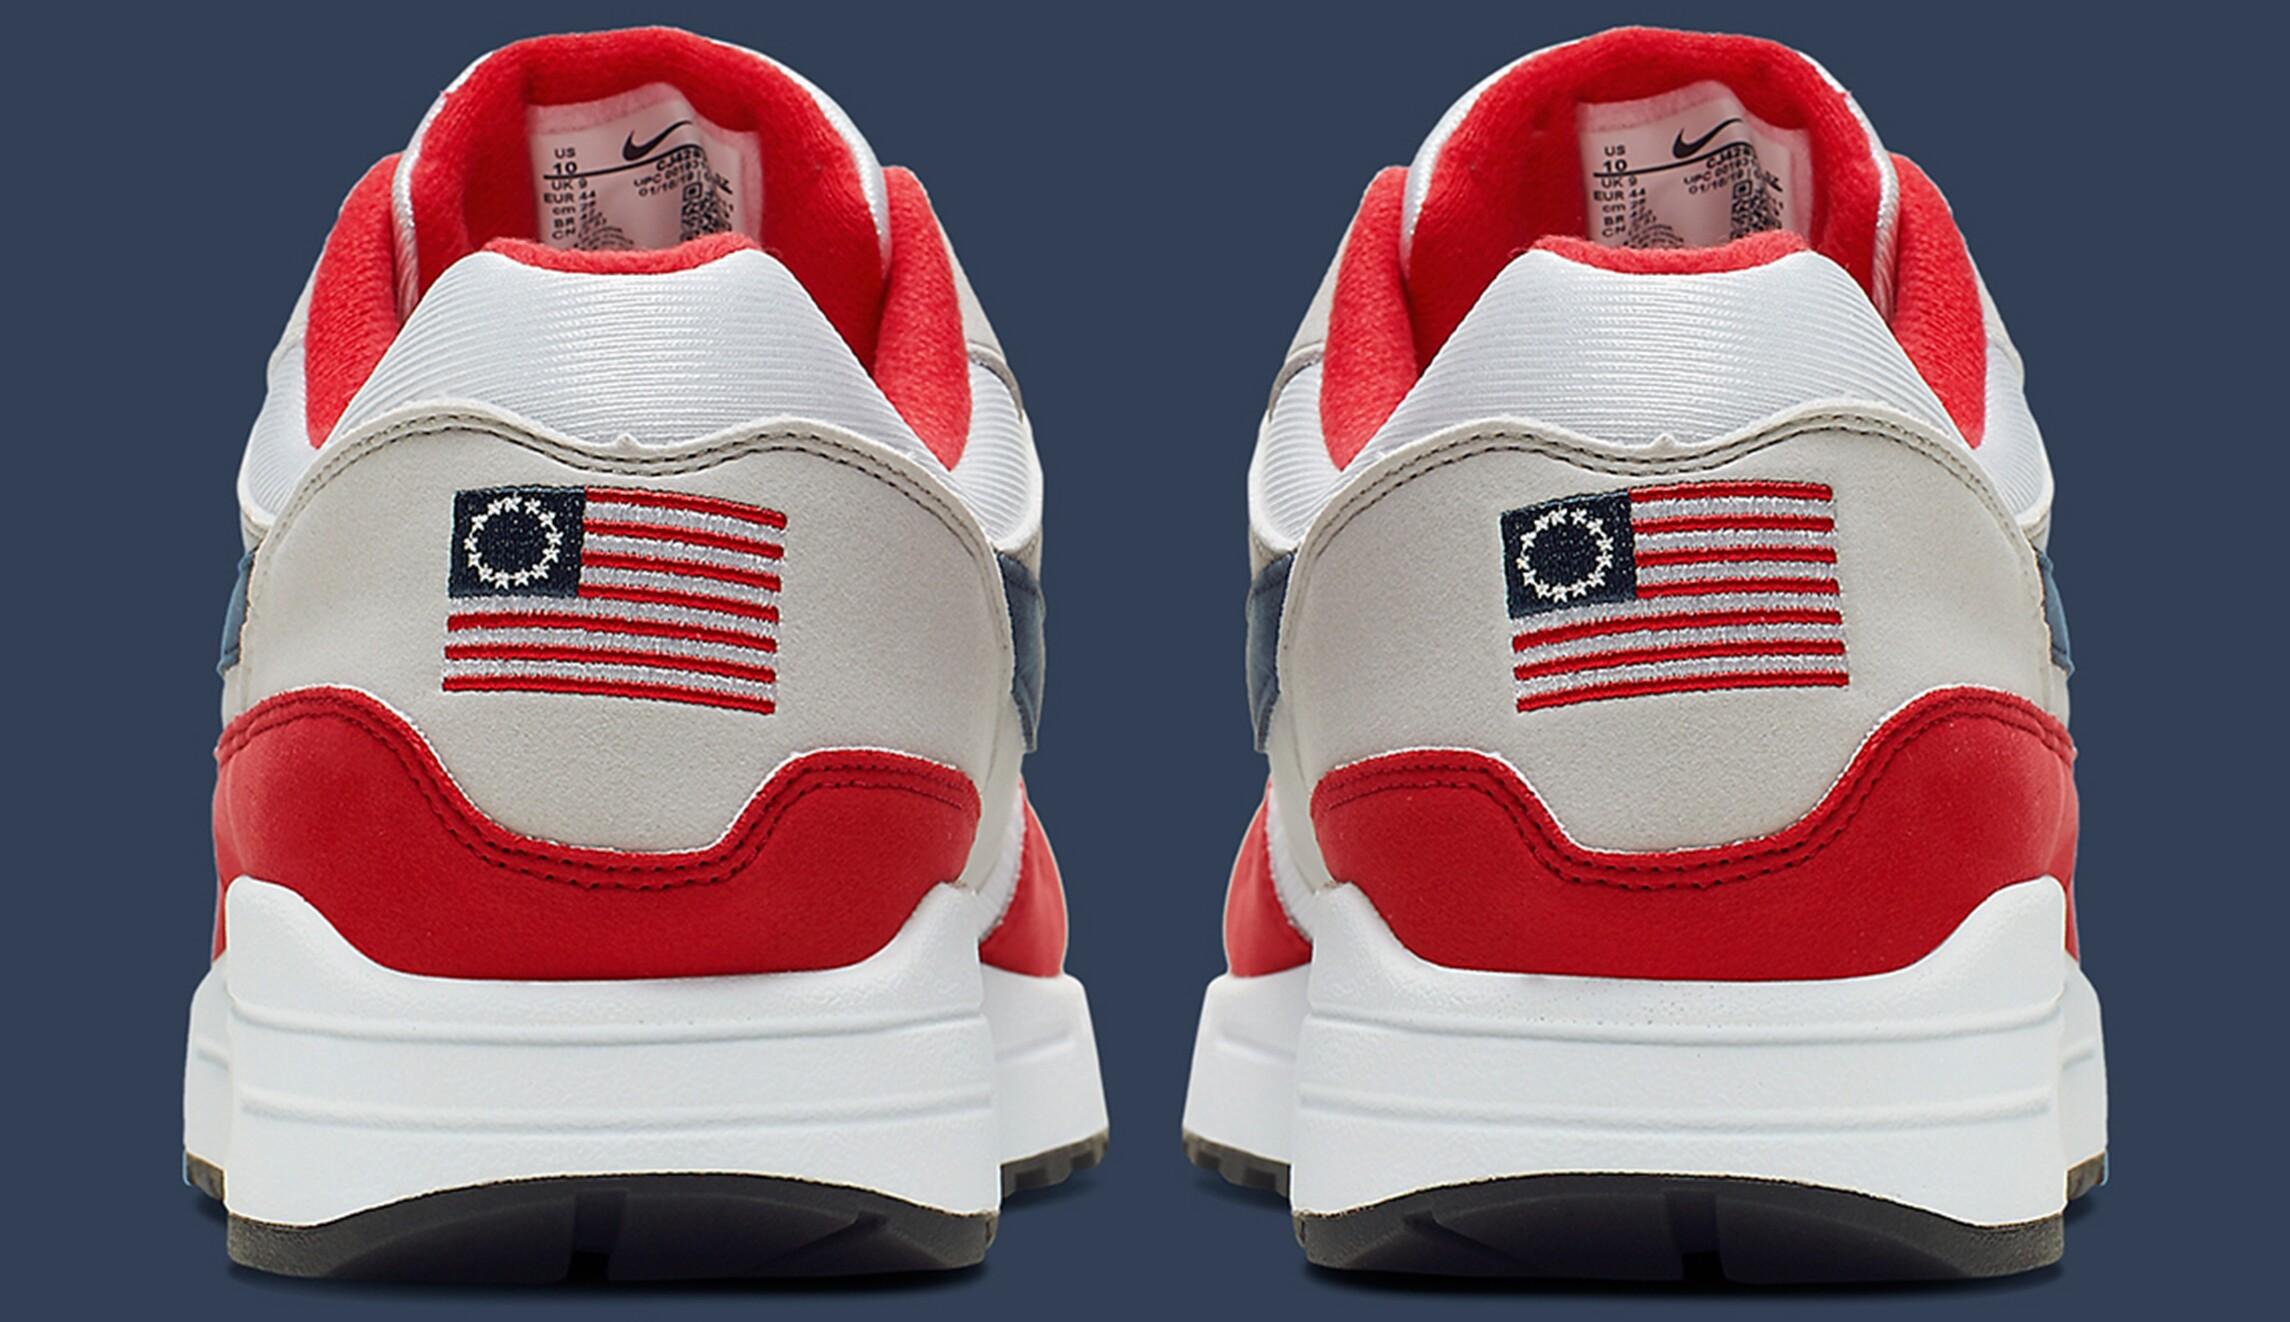 Nike Betsy Ross shoes.jpg